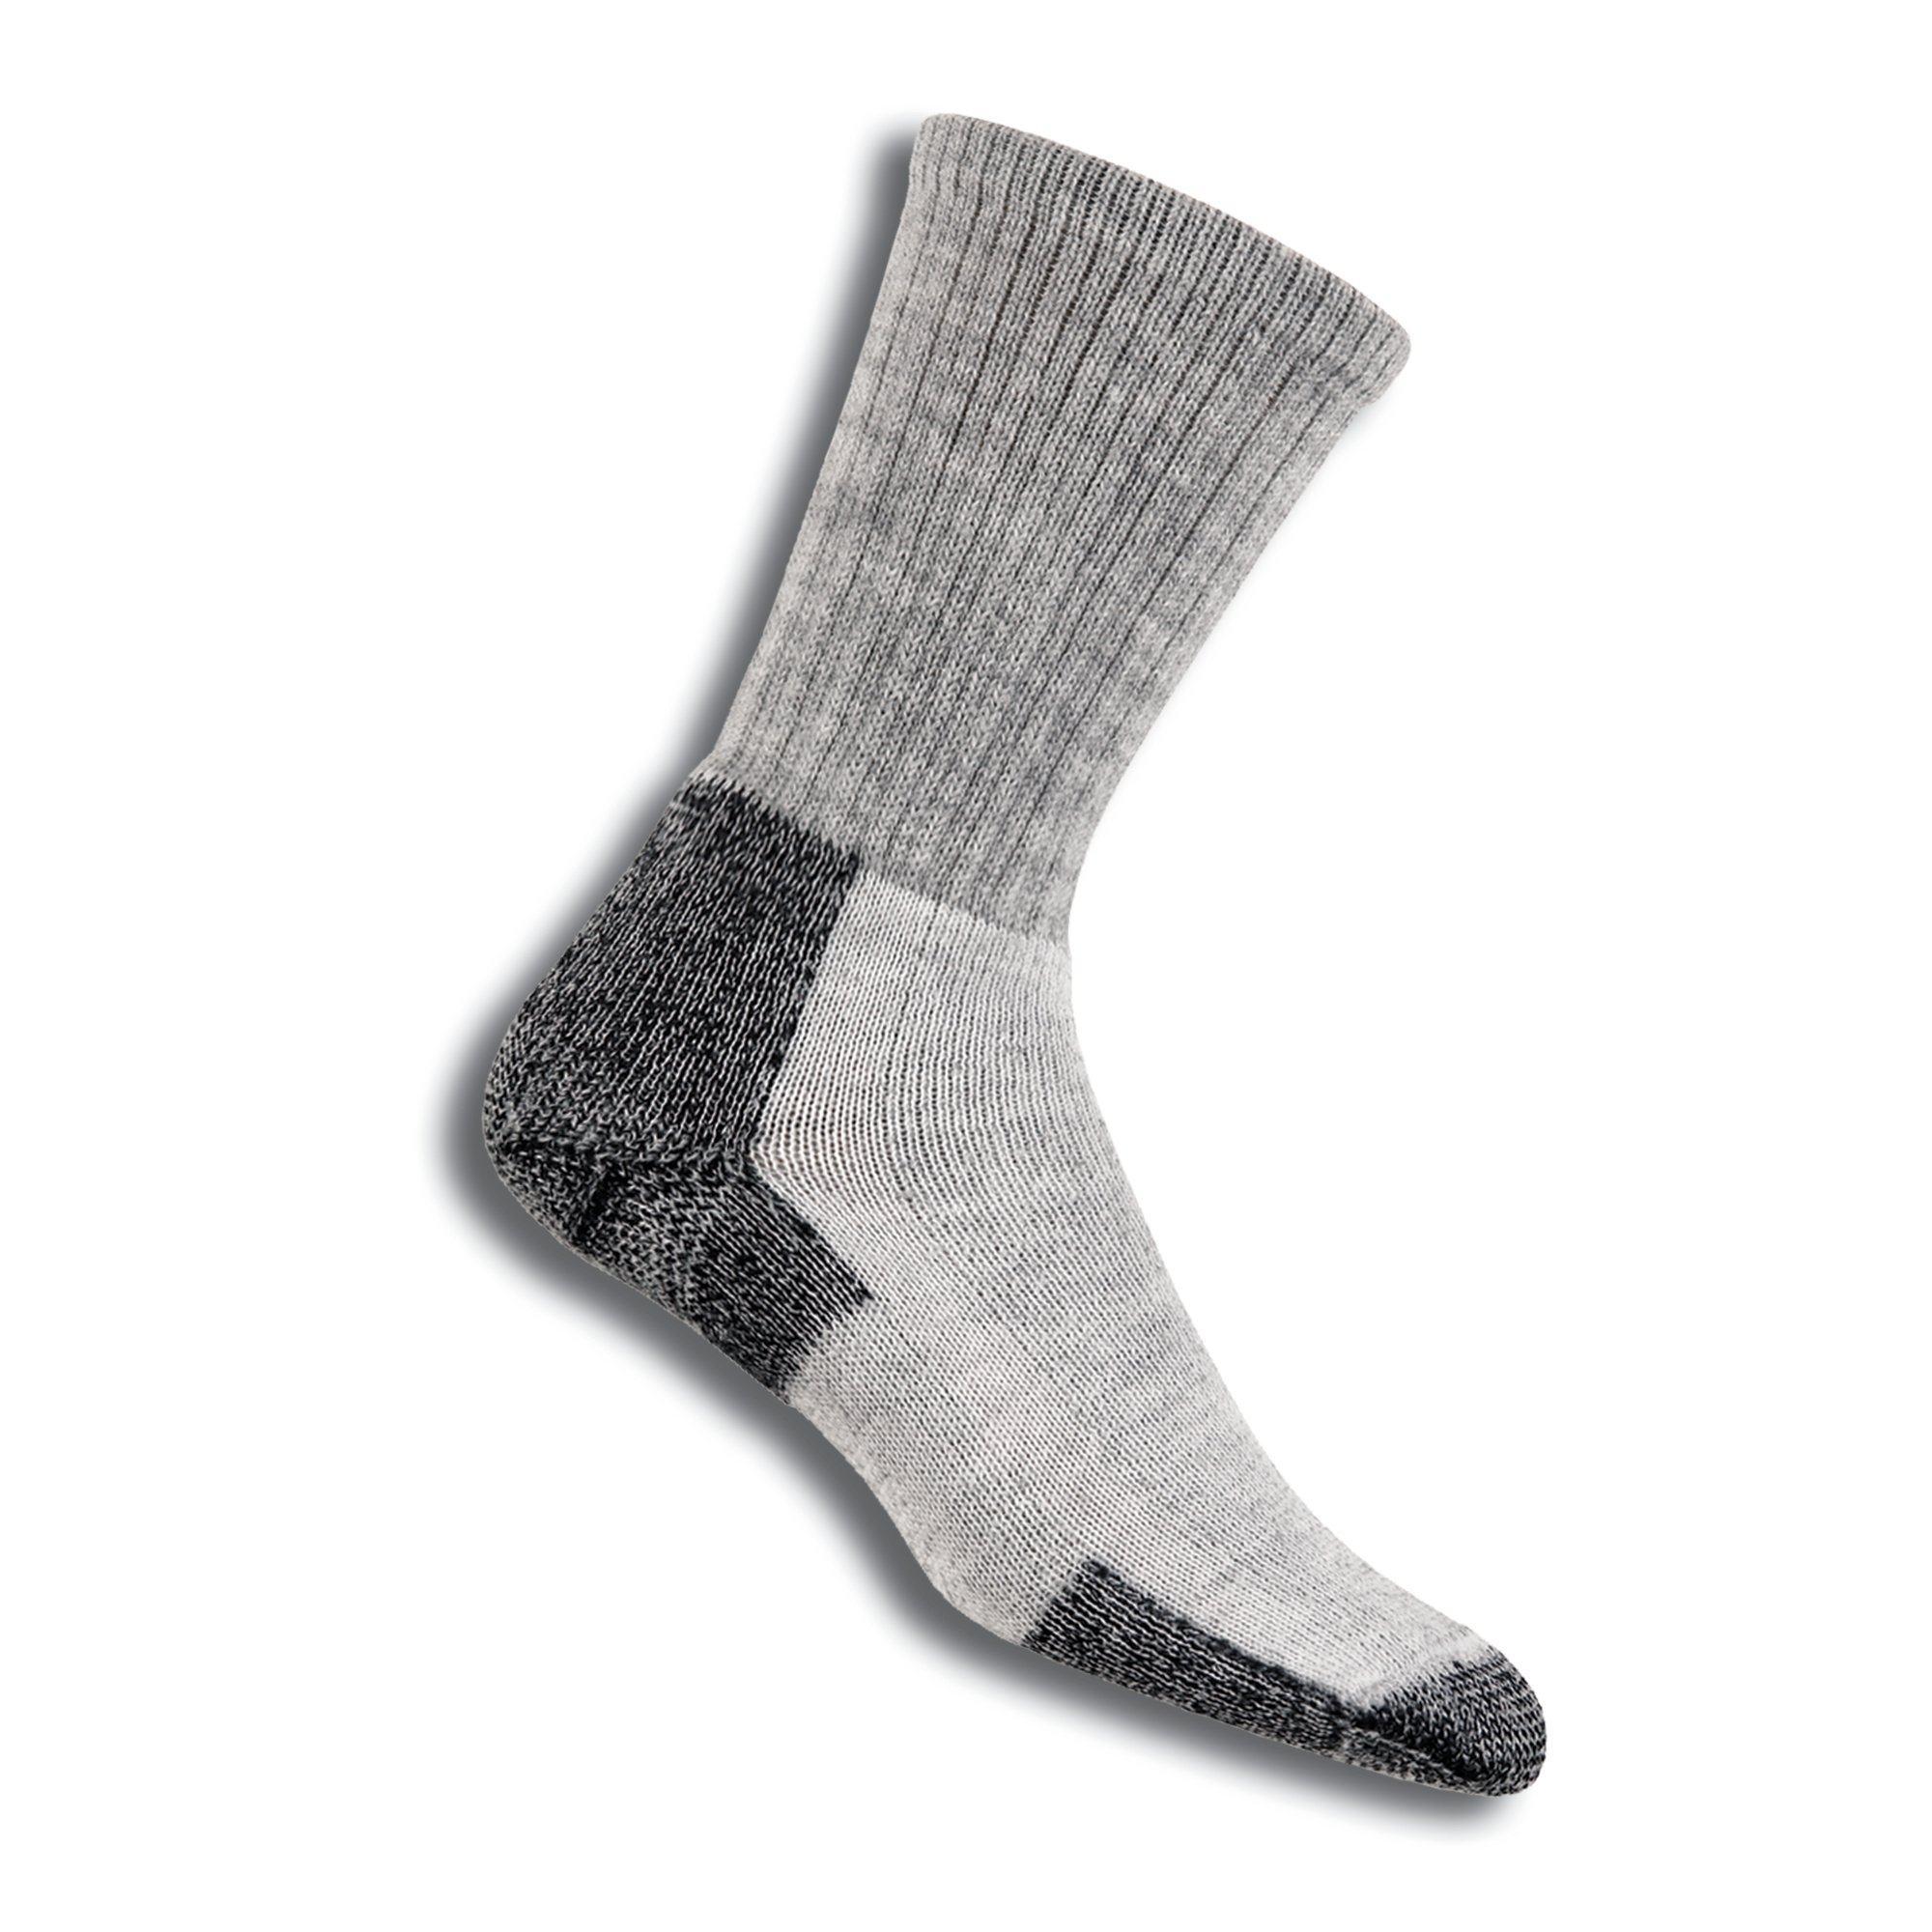 49441b5ff3cf6 Best Rated in Men s Outdoor Recreation Socks   Helpful Customer ...